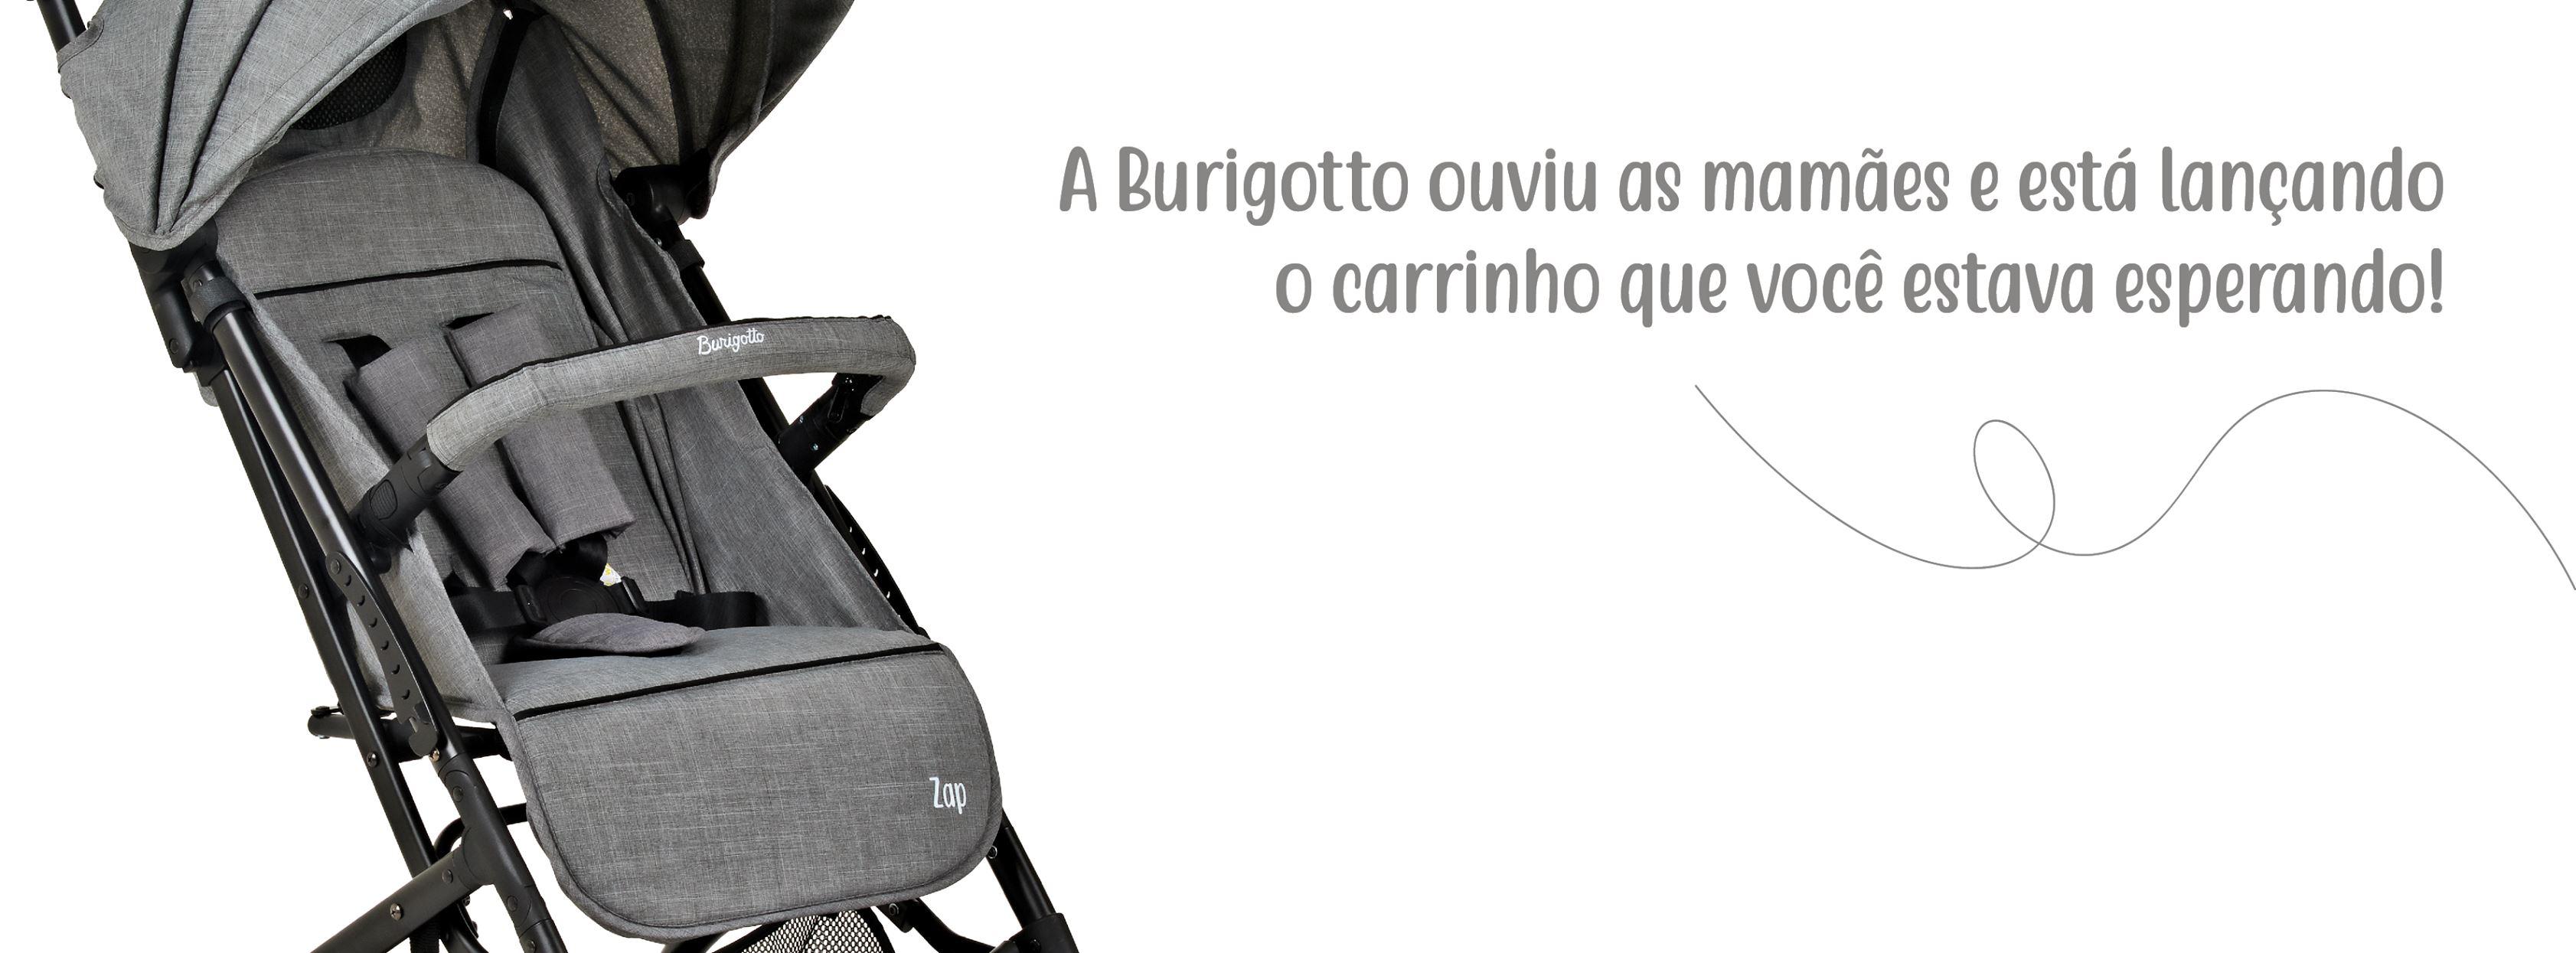 CONJUNTO AT6 K burigotto